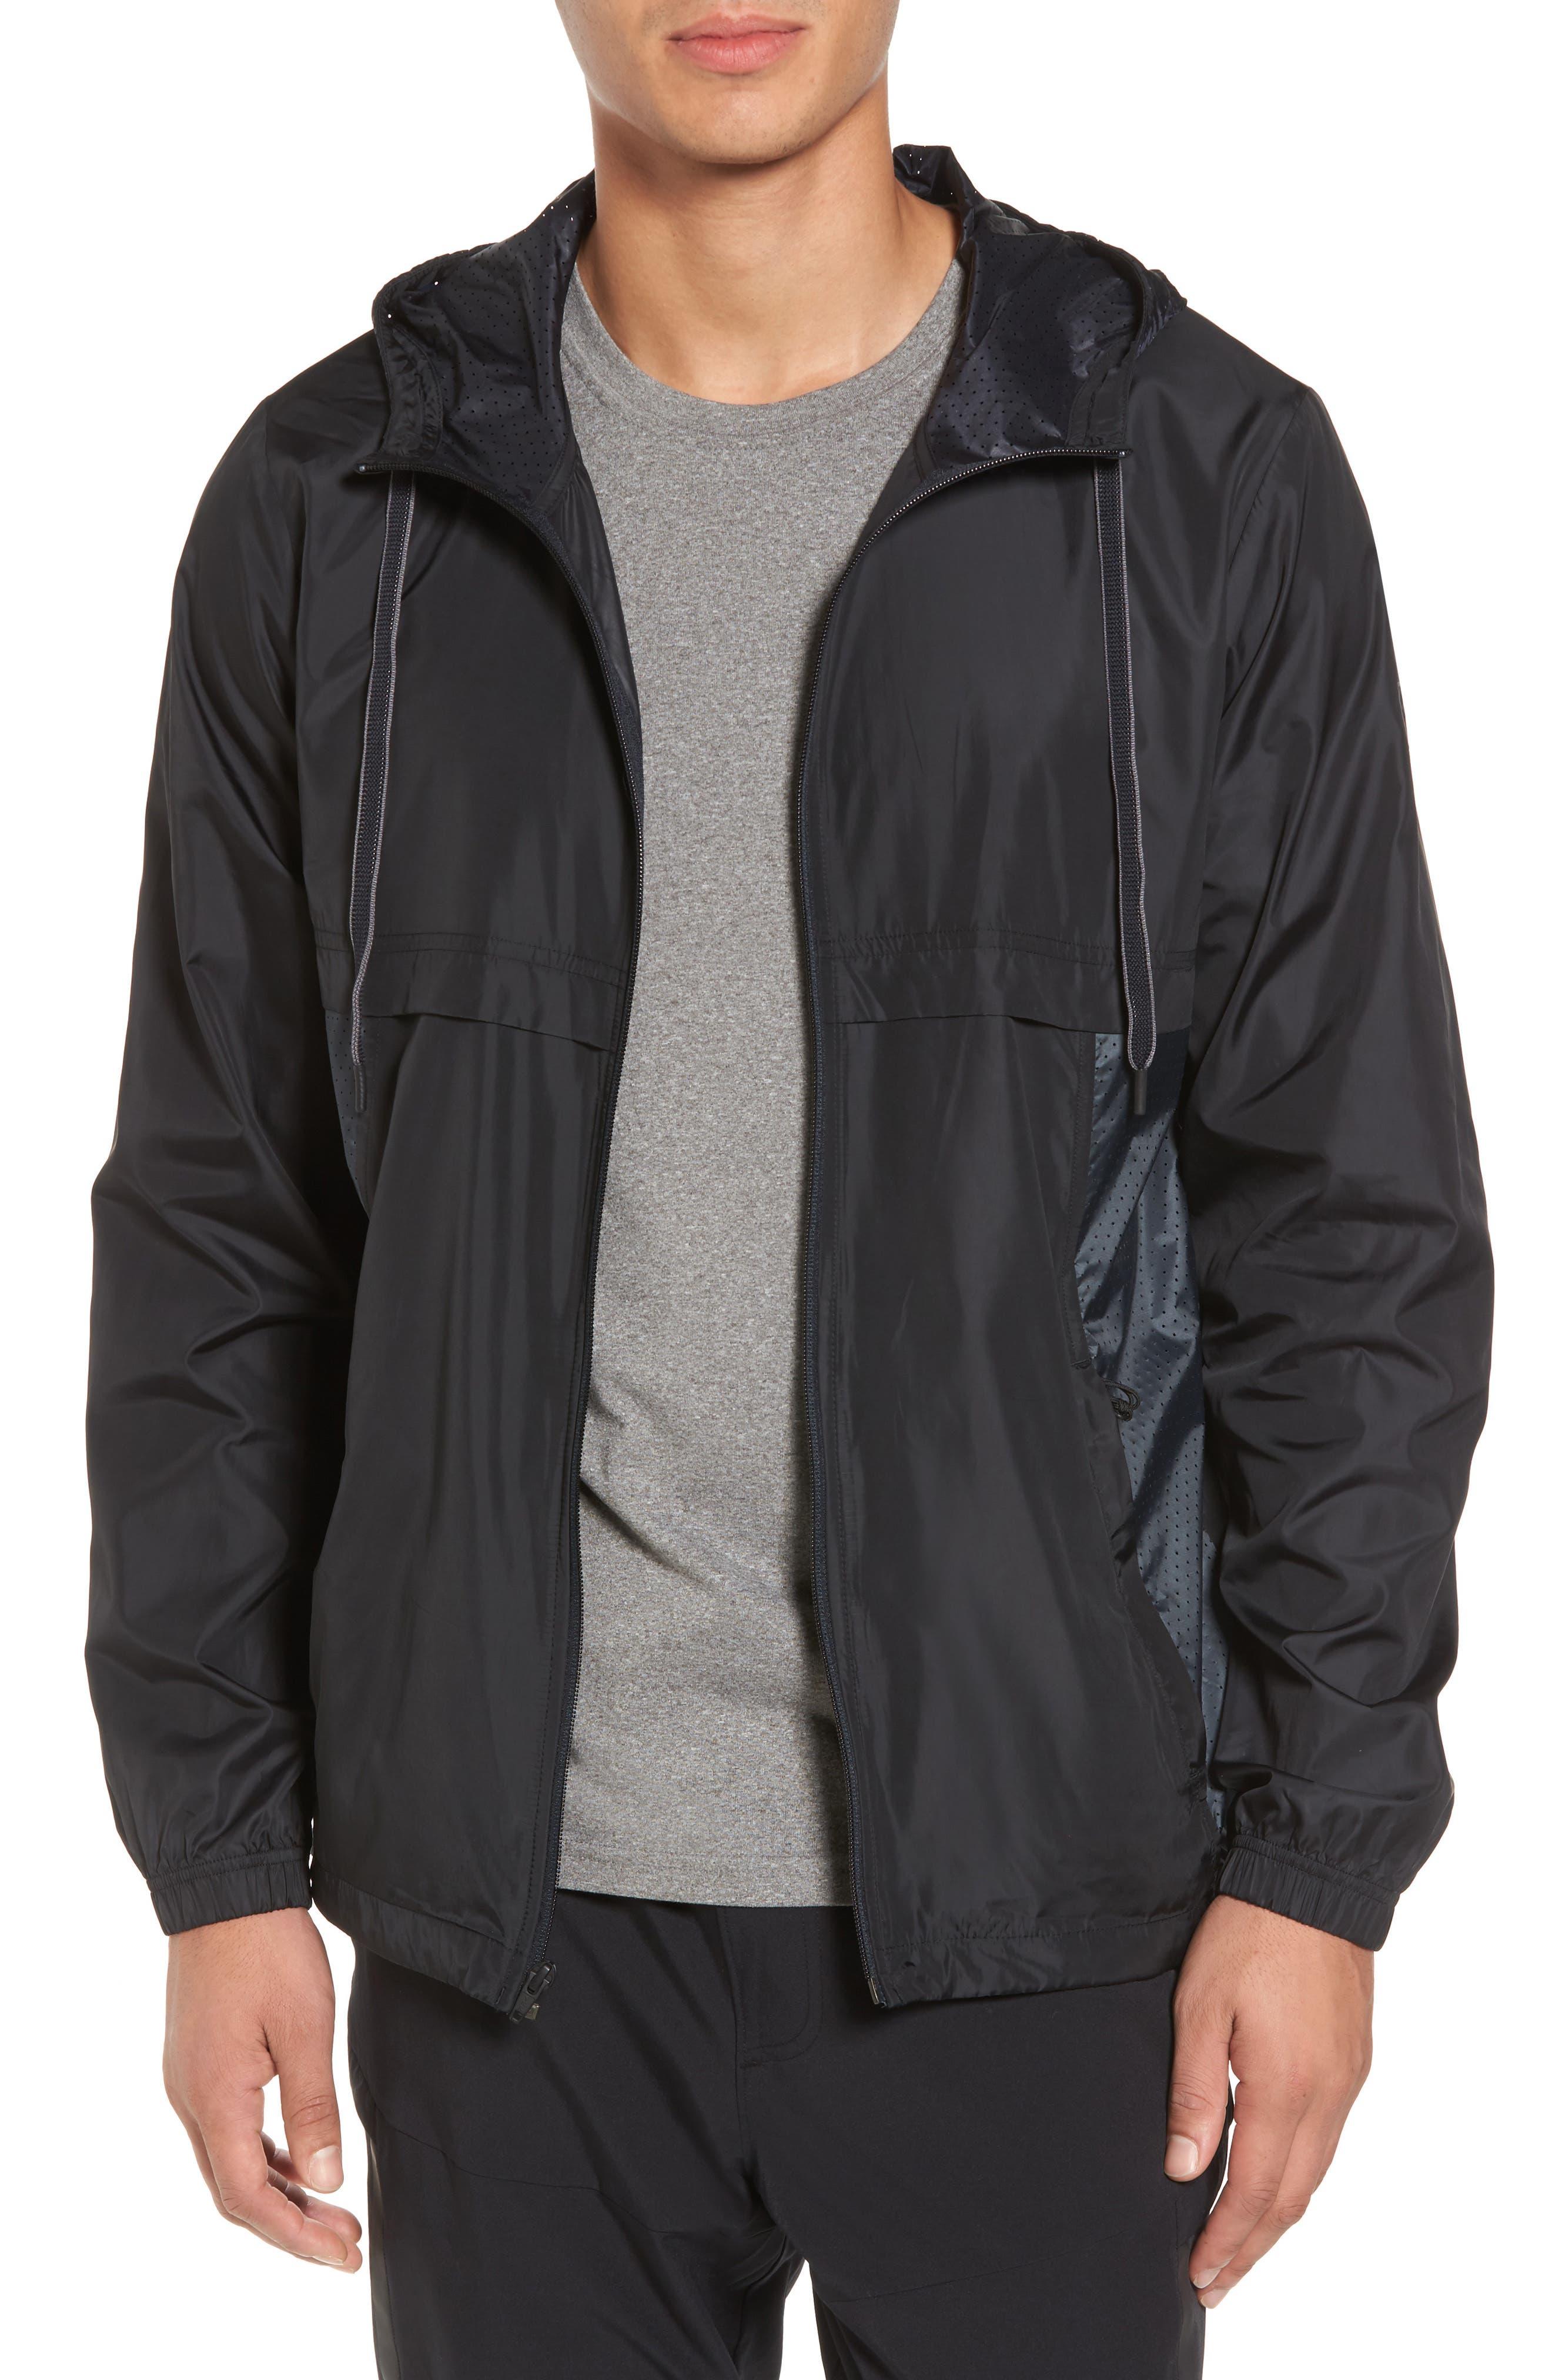 Sportstyle Windbreaker,                         Main,                         color, Black / Overcast Grey